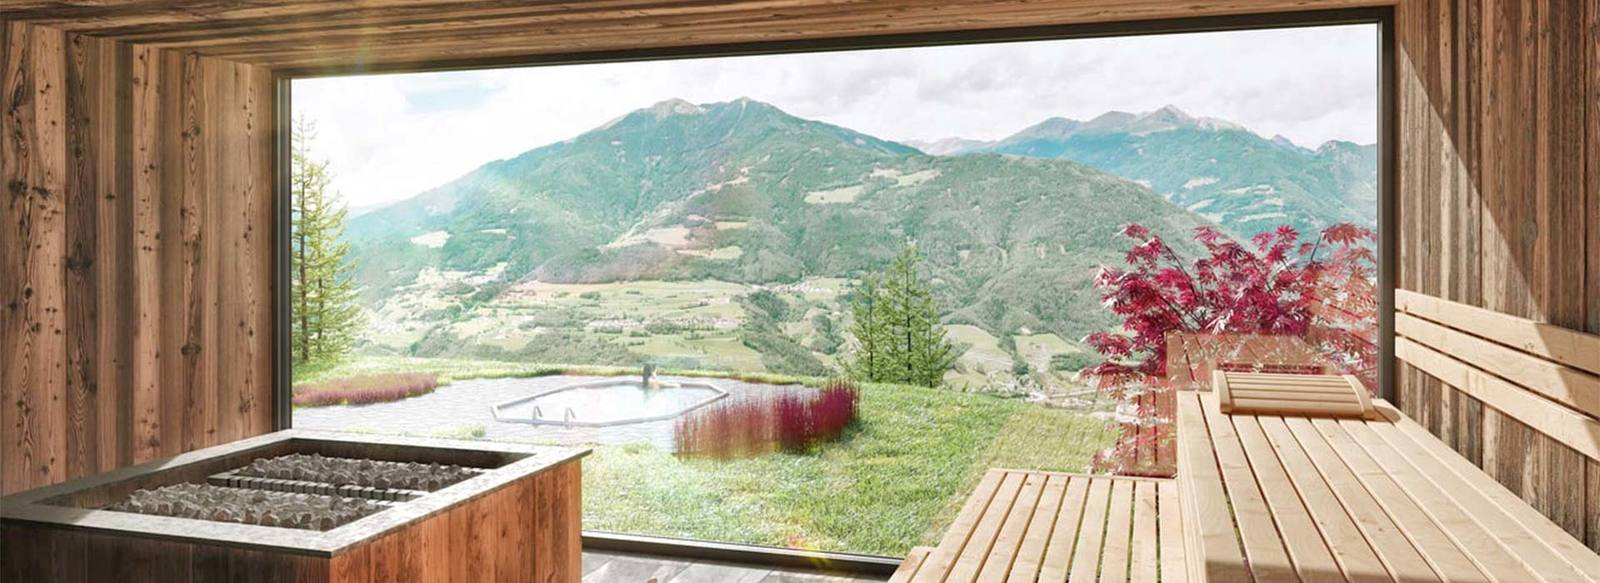 Posizione panoramica, in Val di Isarco